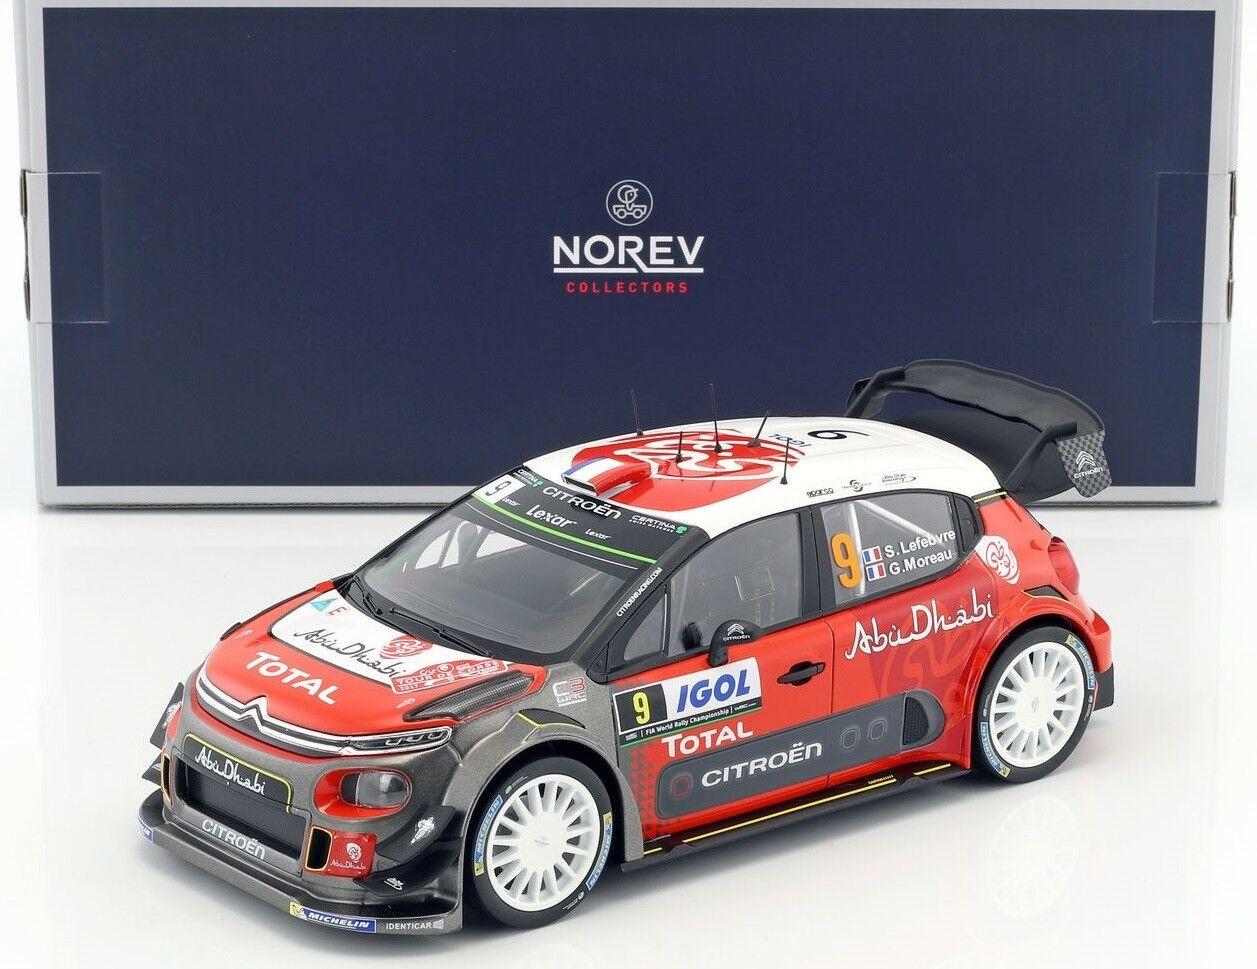 NOREV181633 - Voiture de rallye CITROEN C3 WRC N°9 rallye de Corse de 2017 équip